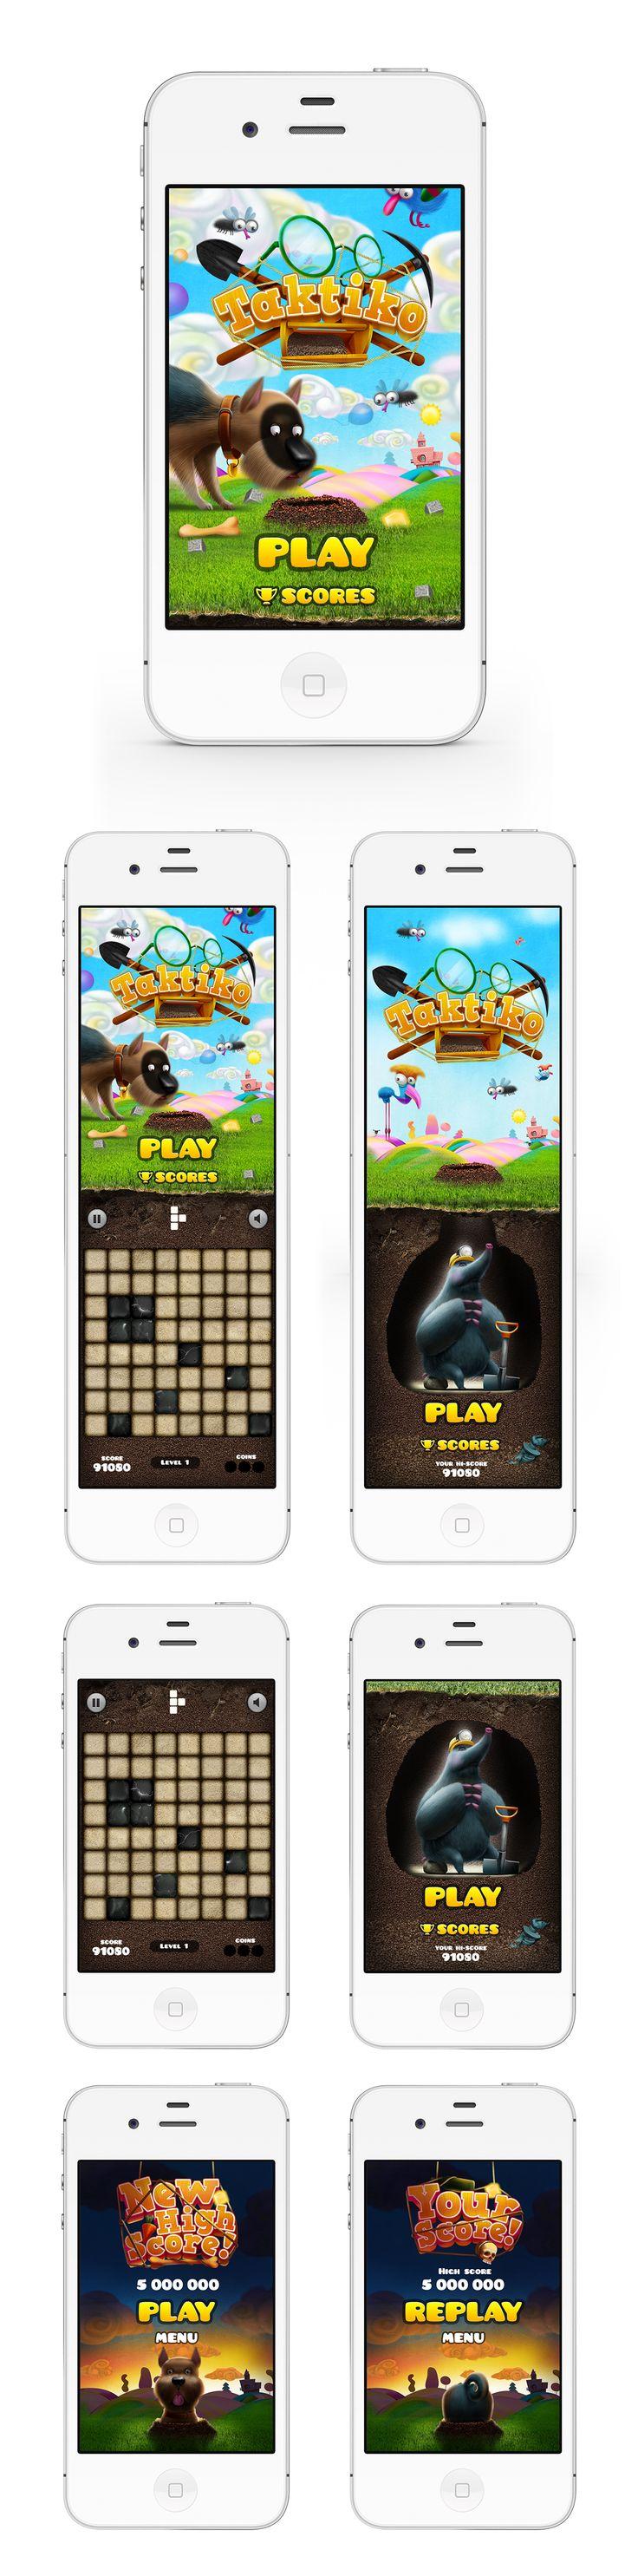 Spookys house of jumpscare e621 - Game Taktiko Ios Mobile On Behance